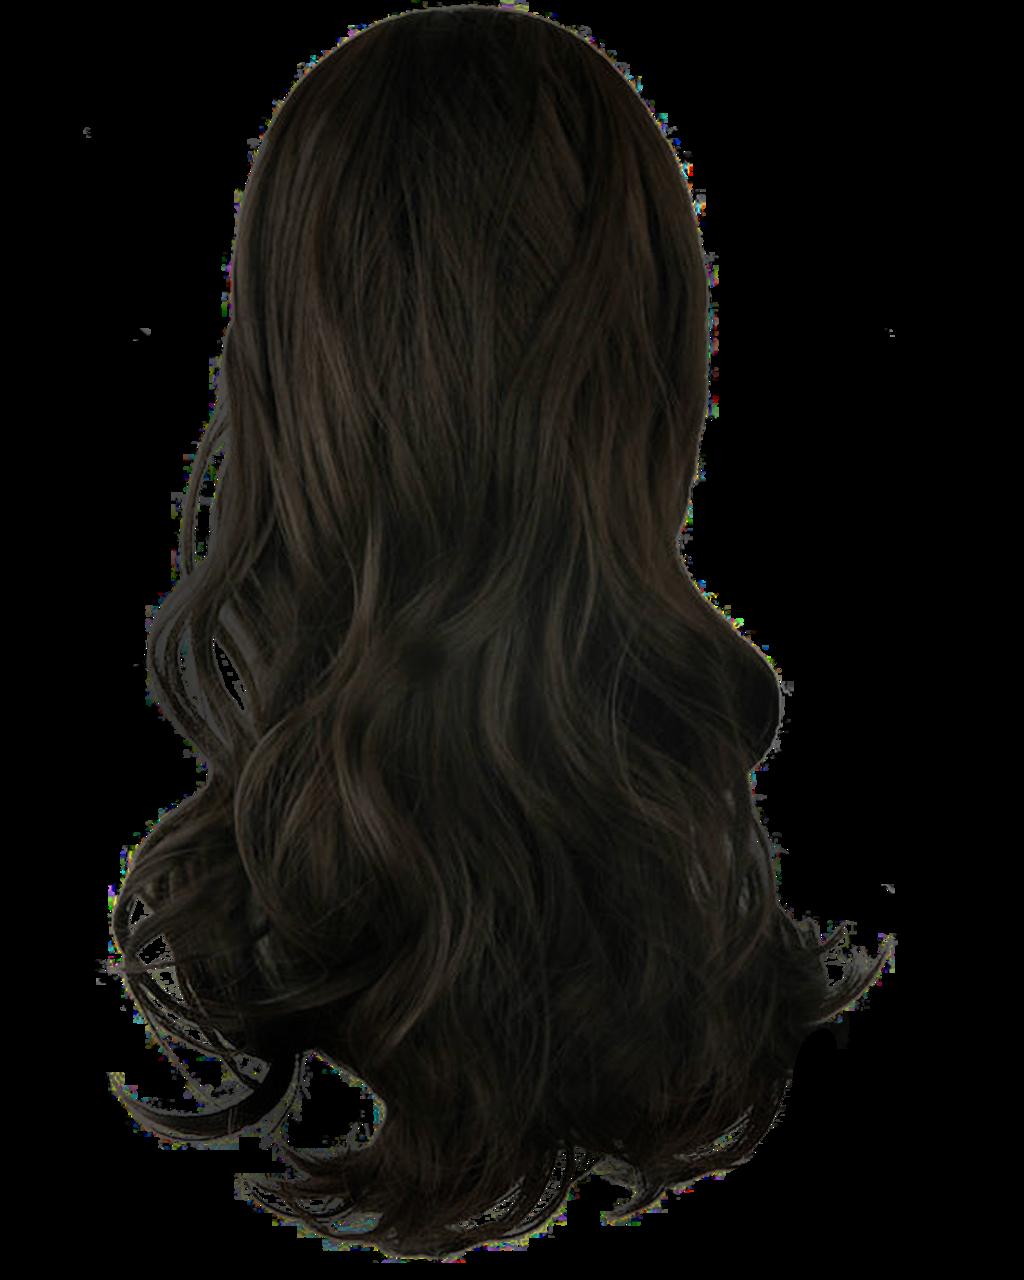 Download Png Image Women Hair Png Image